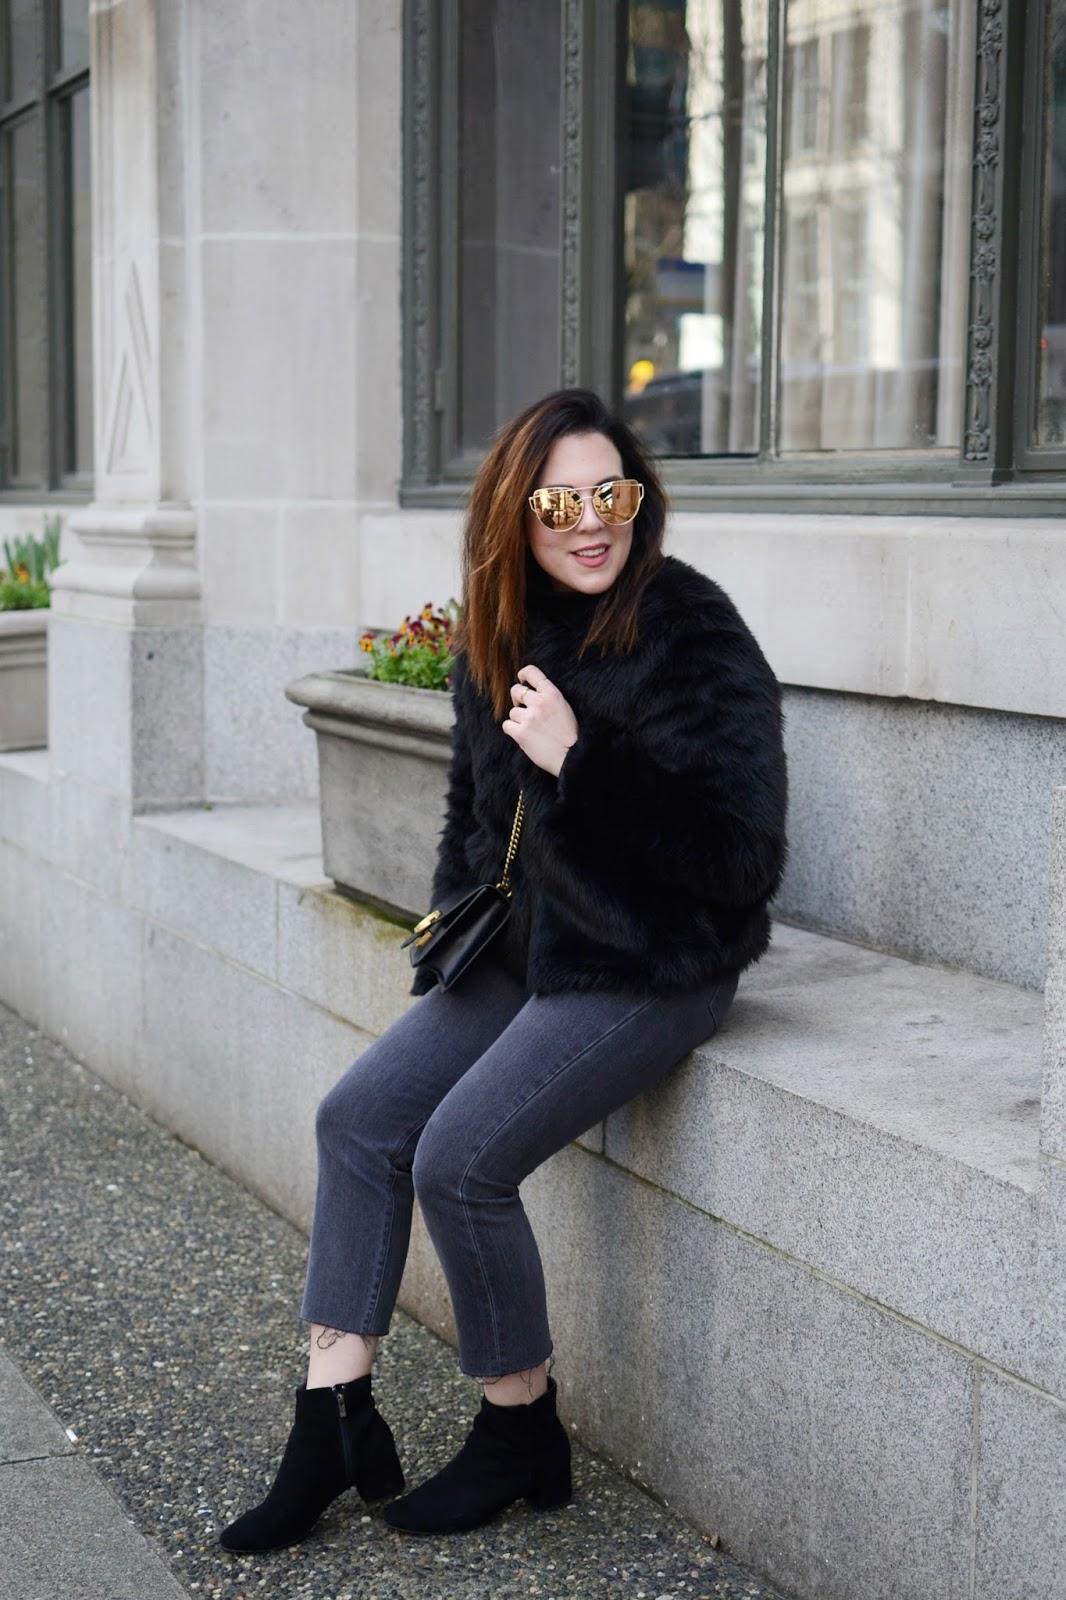 faux fur coat outfit levis wedgie jeans le chateau suede ankle boots gucci marmont bag aleesha harris